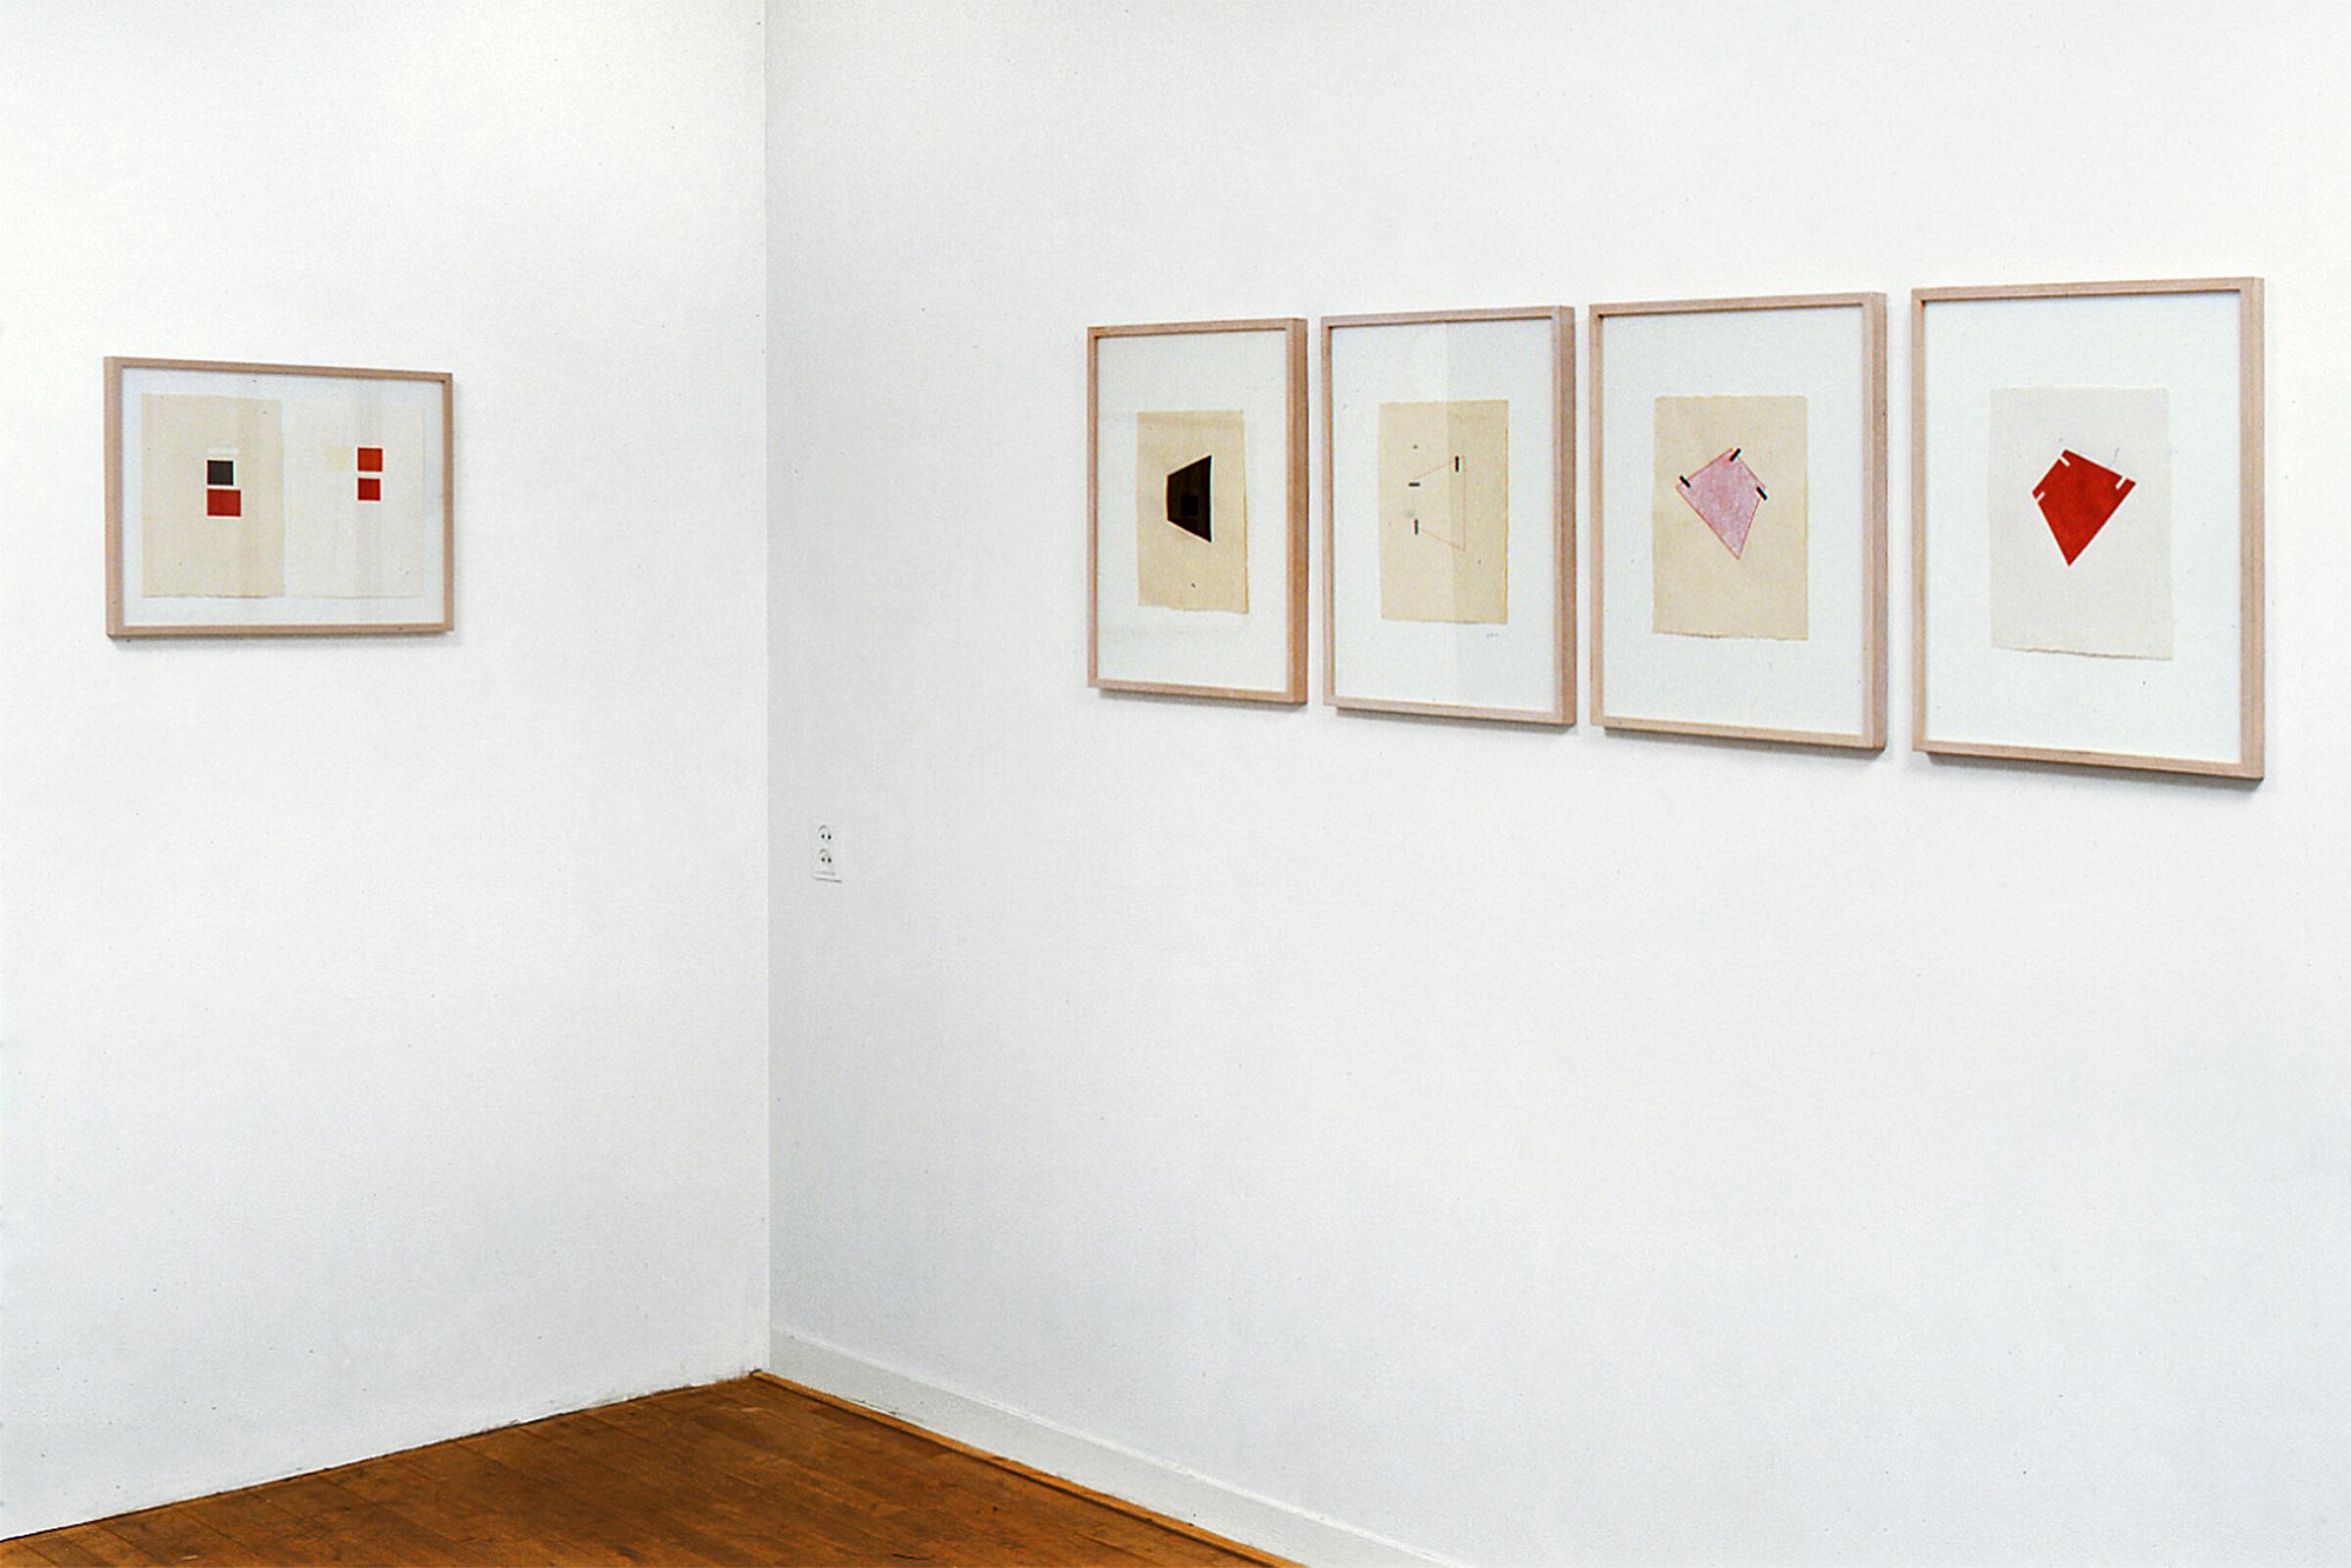 Alan-Uglow-Galerie-Onrust-EX-1989-01